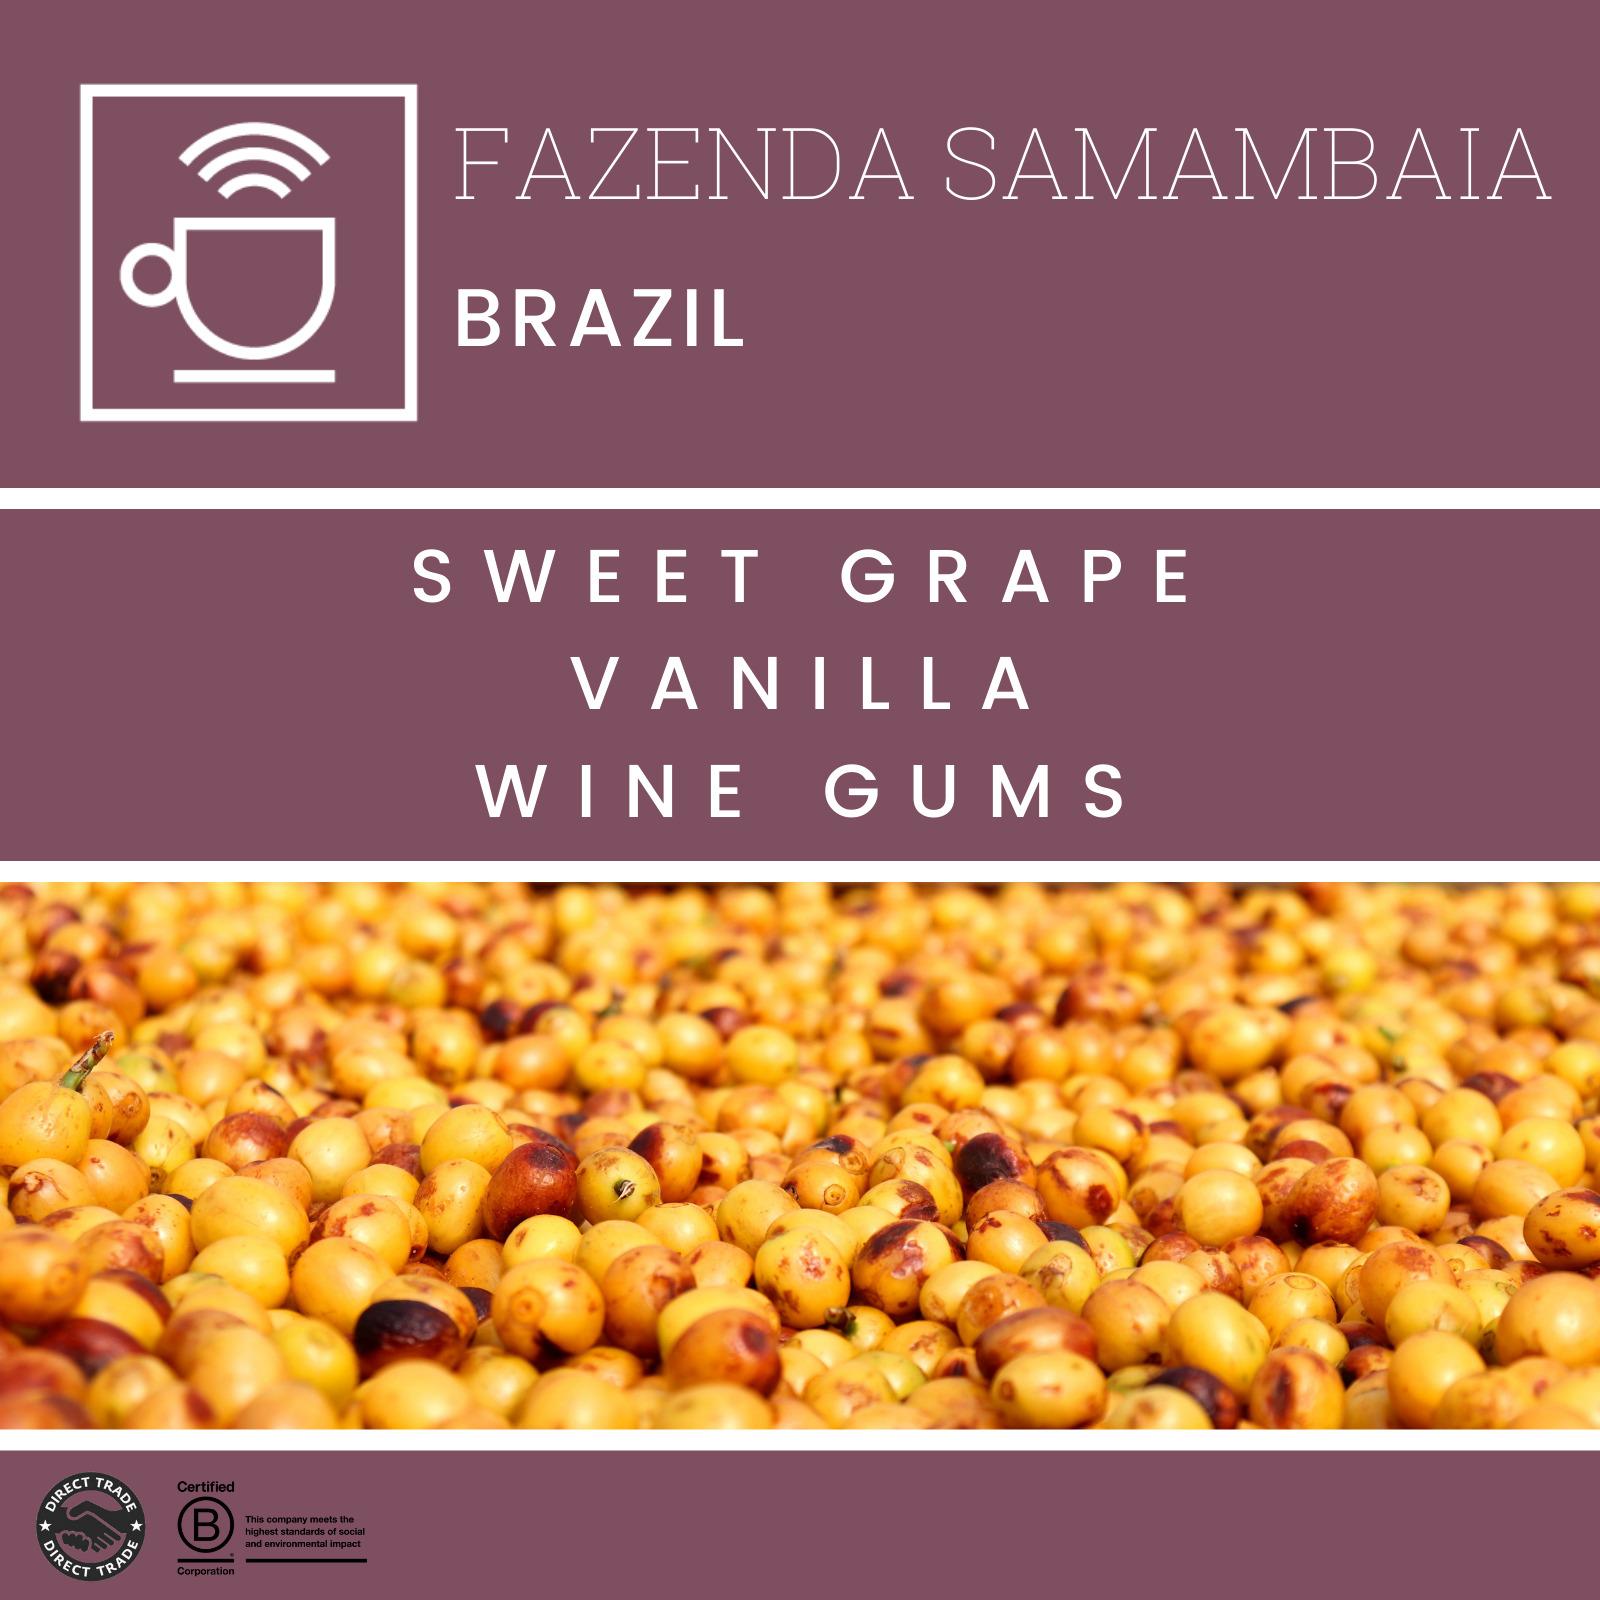 Fazenda Samambaia anaerobic - Brasil, Clever Coffee | 250g